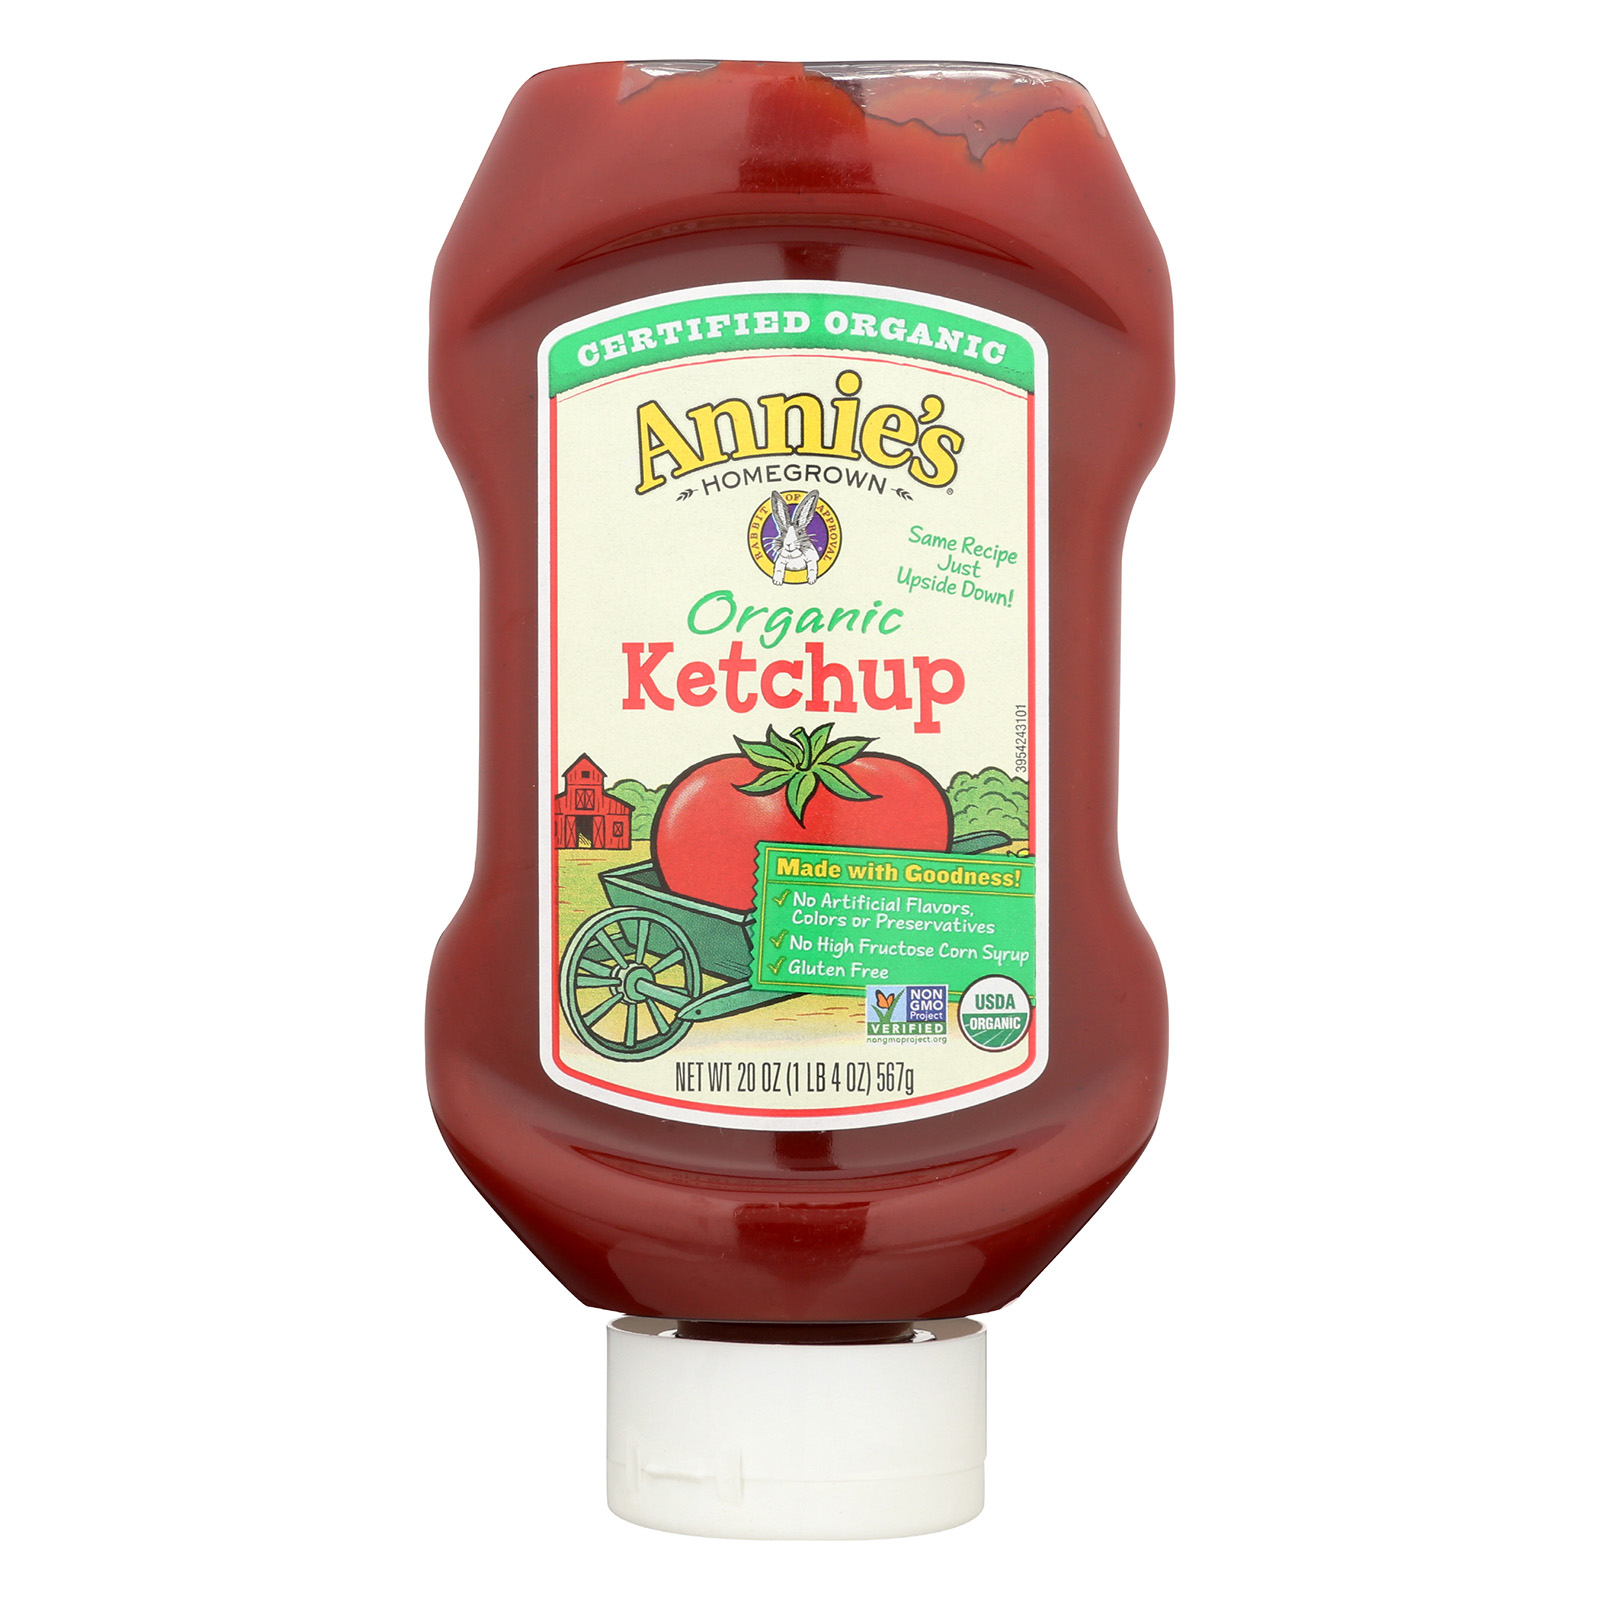 Annie's Homegrown Annie's Naturals Organic Ketchup - Case of 12 - 20 oz.